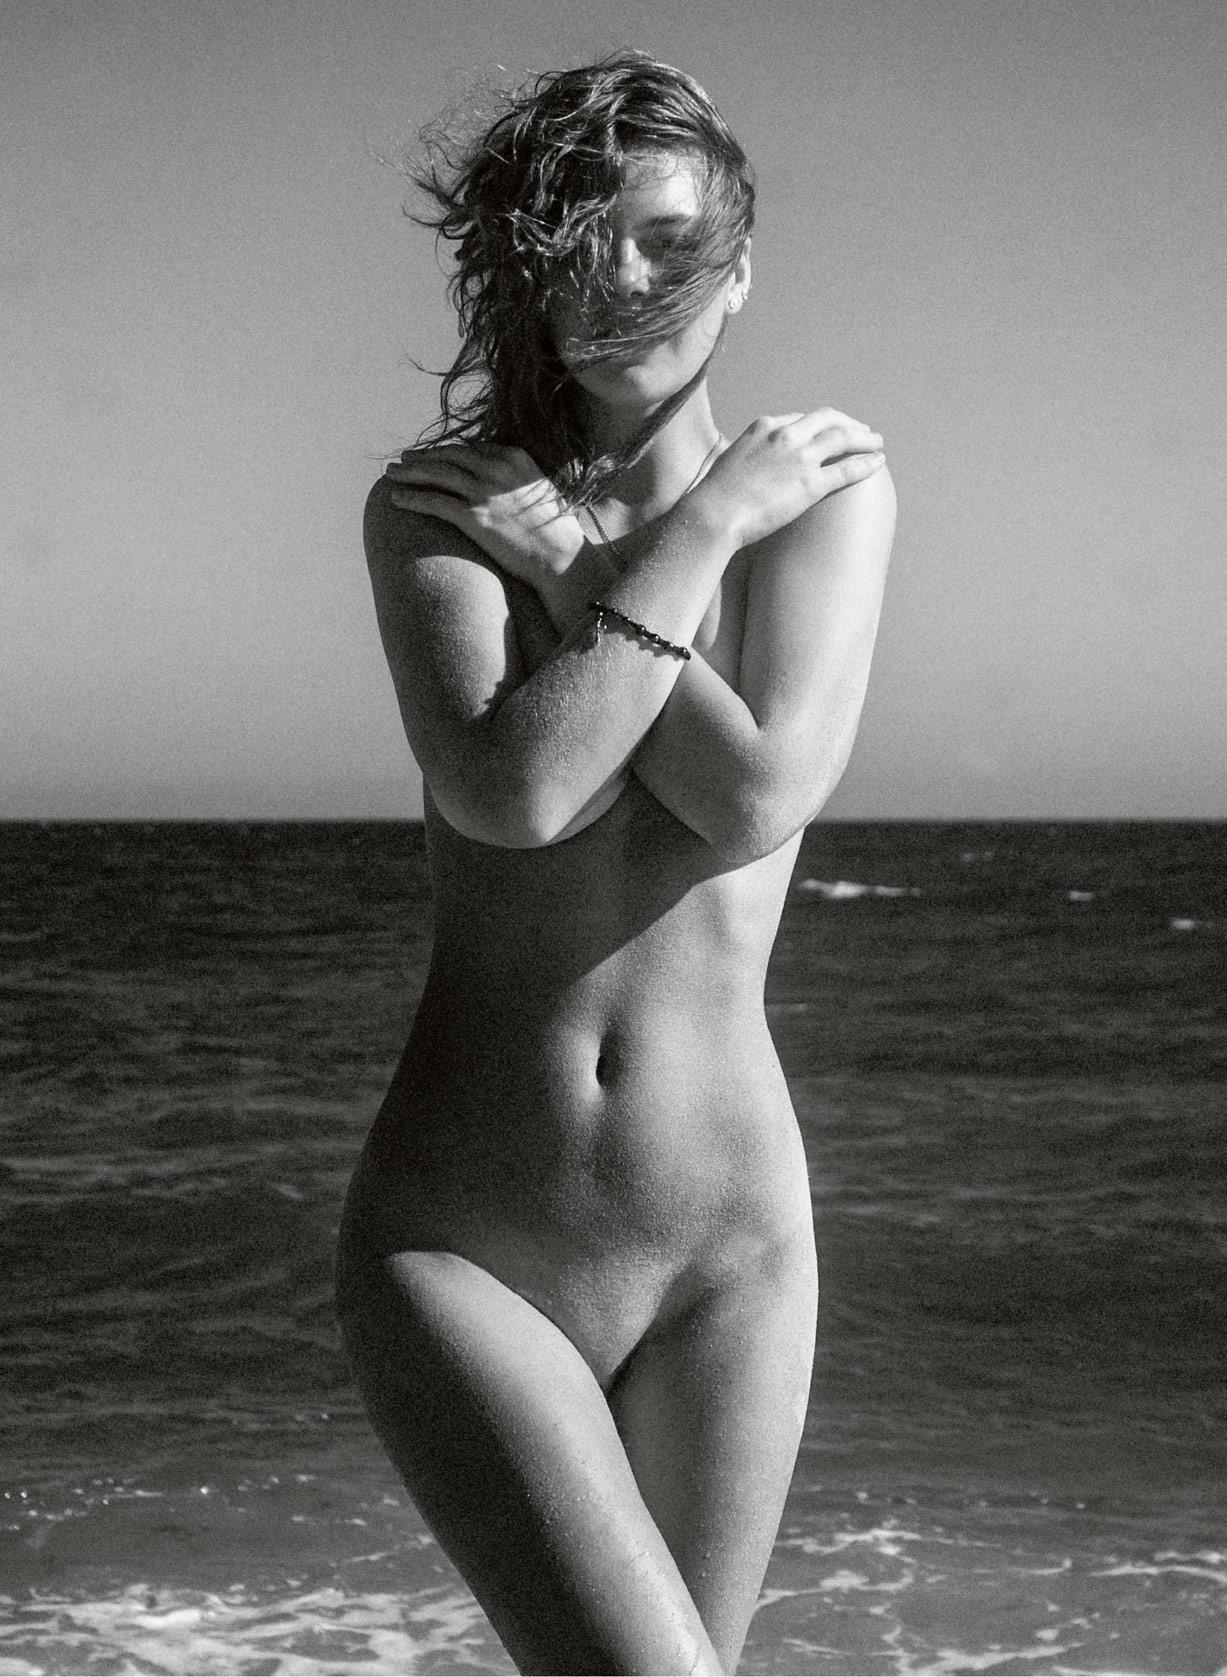 голая Виктория Липатова / Viktoria Lipatova nude by Orlando Goncalves - Insomnia Magazine Issue 01, April 2015